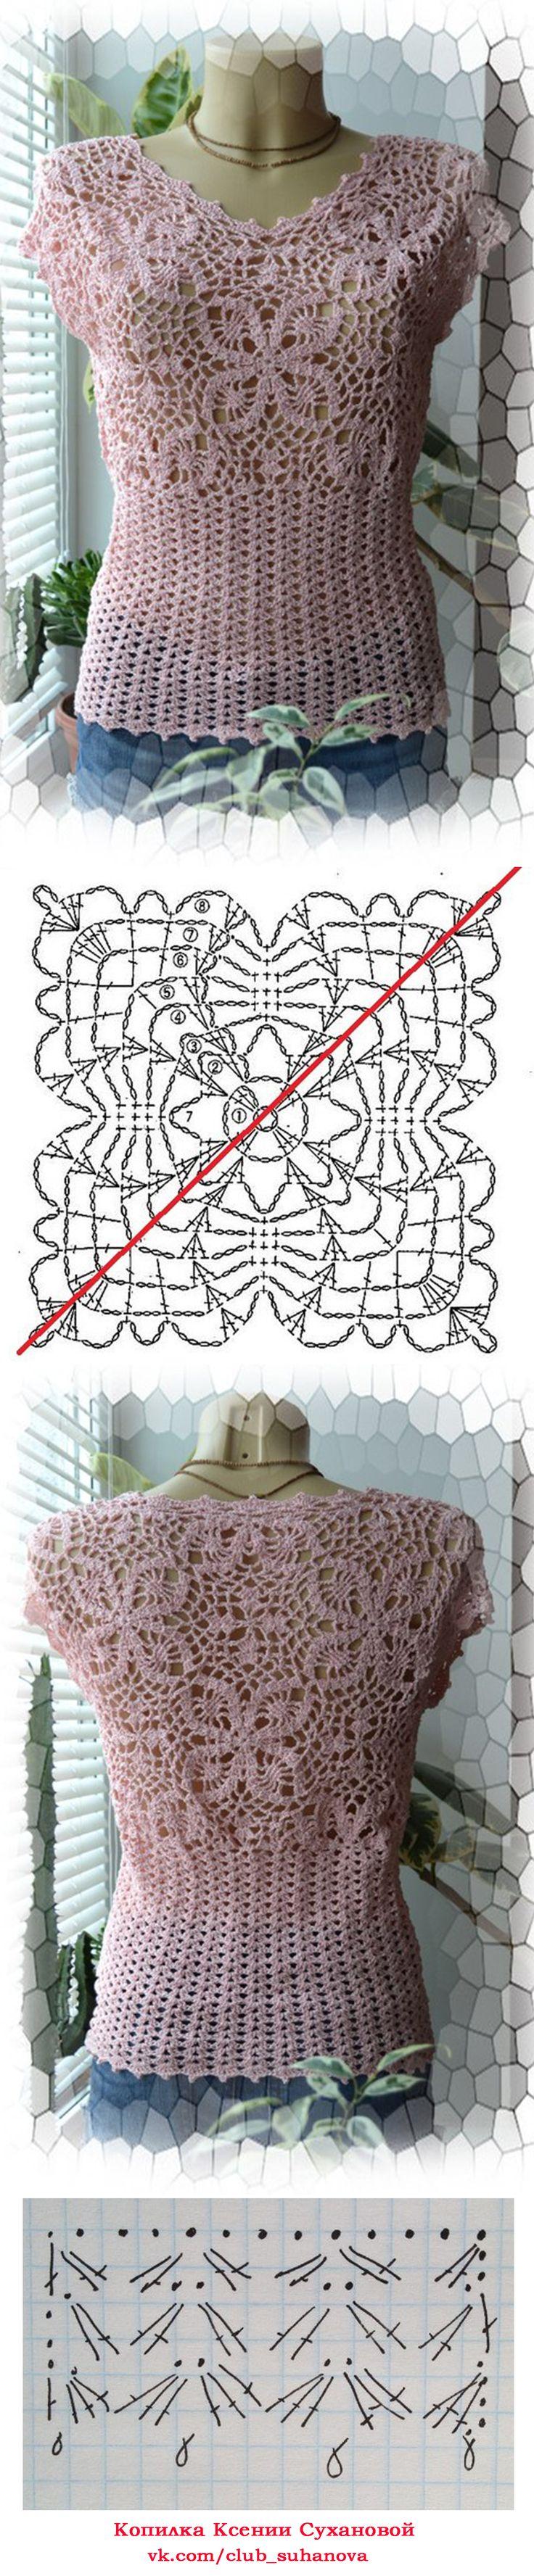 495 best Crochet Patterns & Diagrams images on Pinterest | Crochet ...